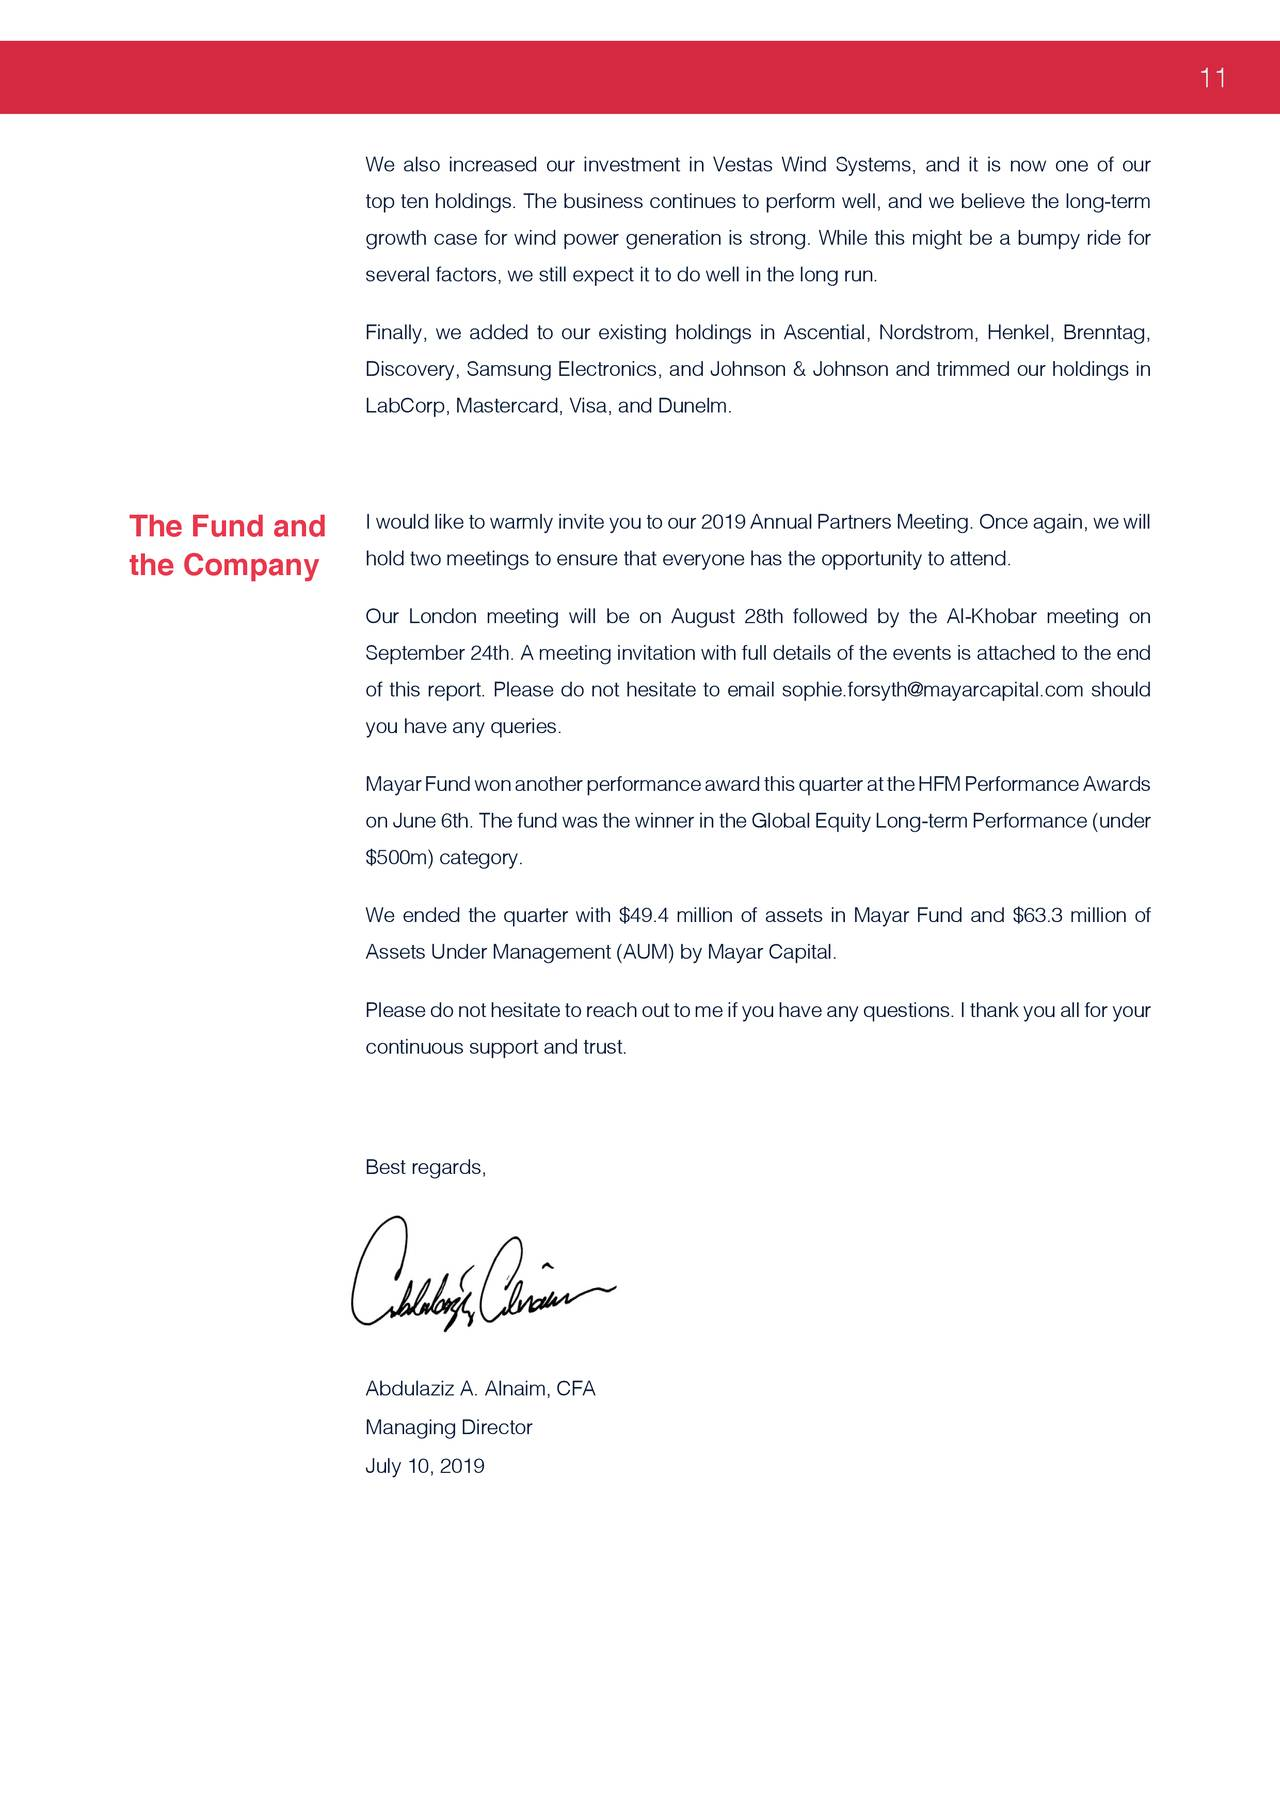 Mayar Fund's Q2 2019 Letter To Partners | Seeking Alpha